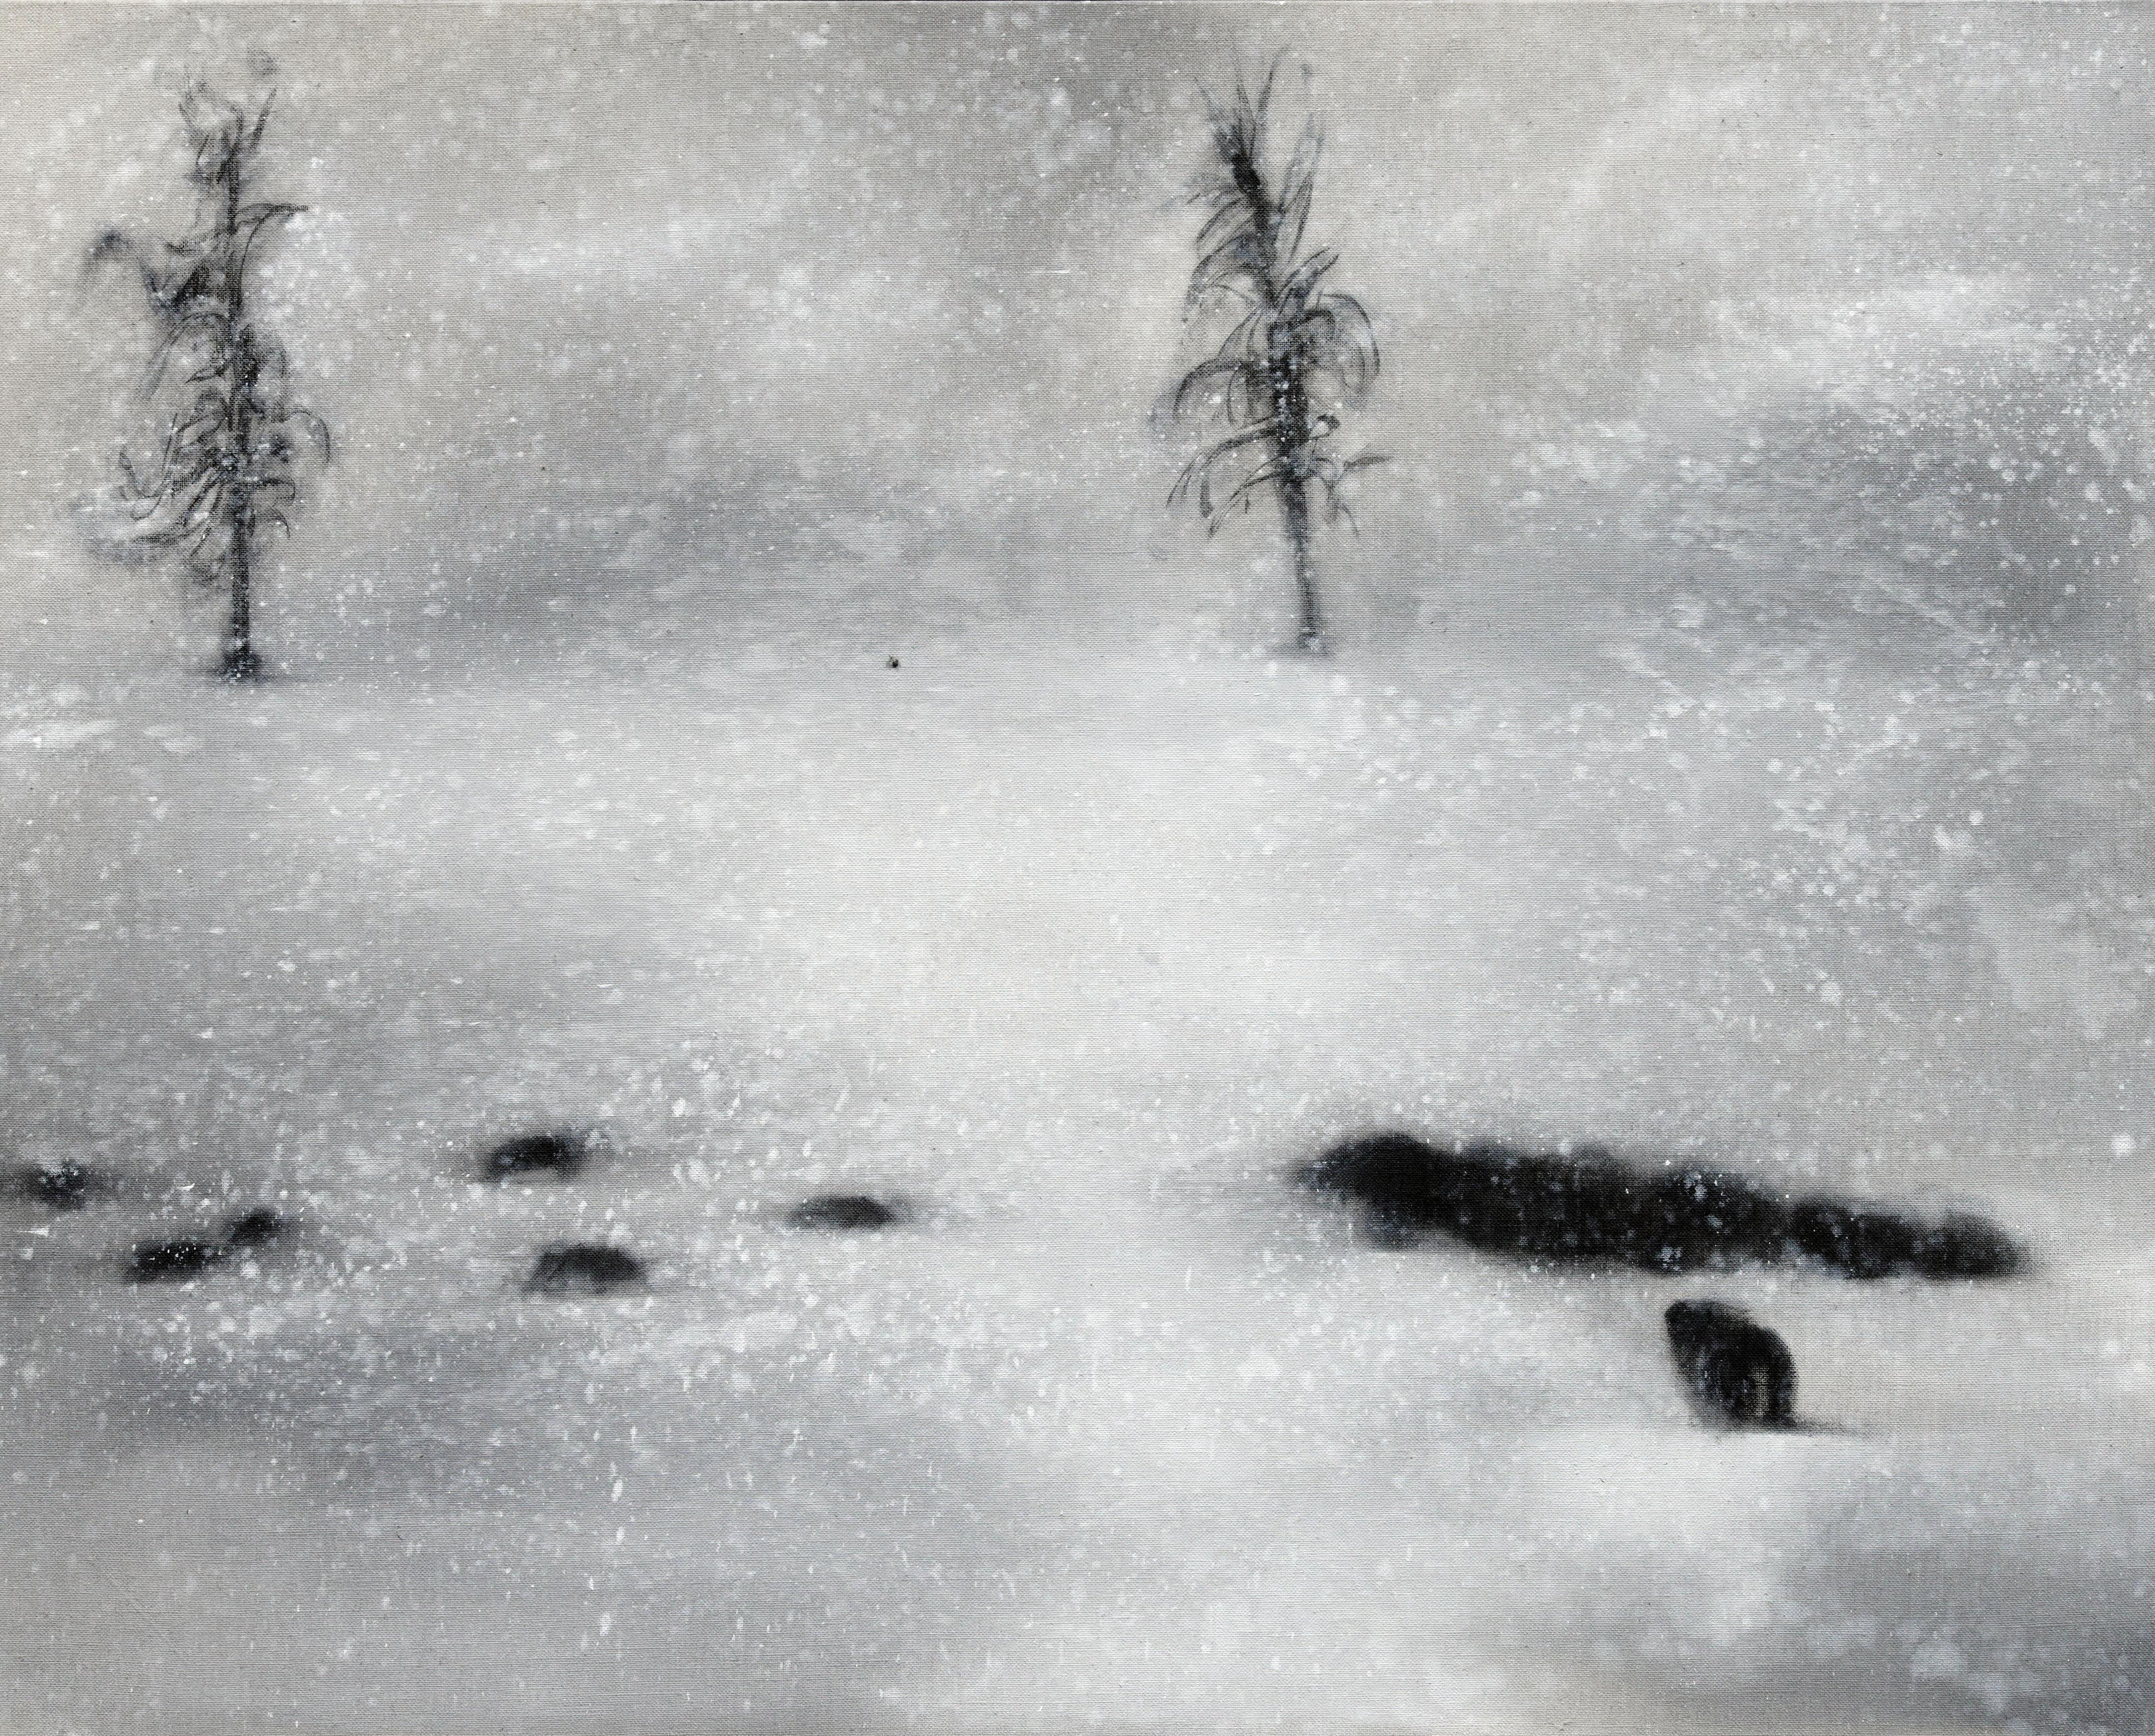 Instinct_Landscape_006